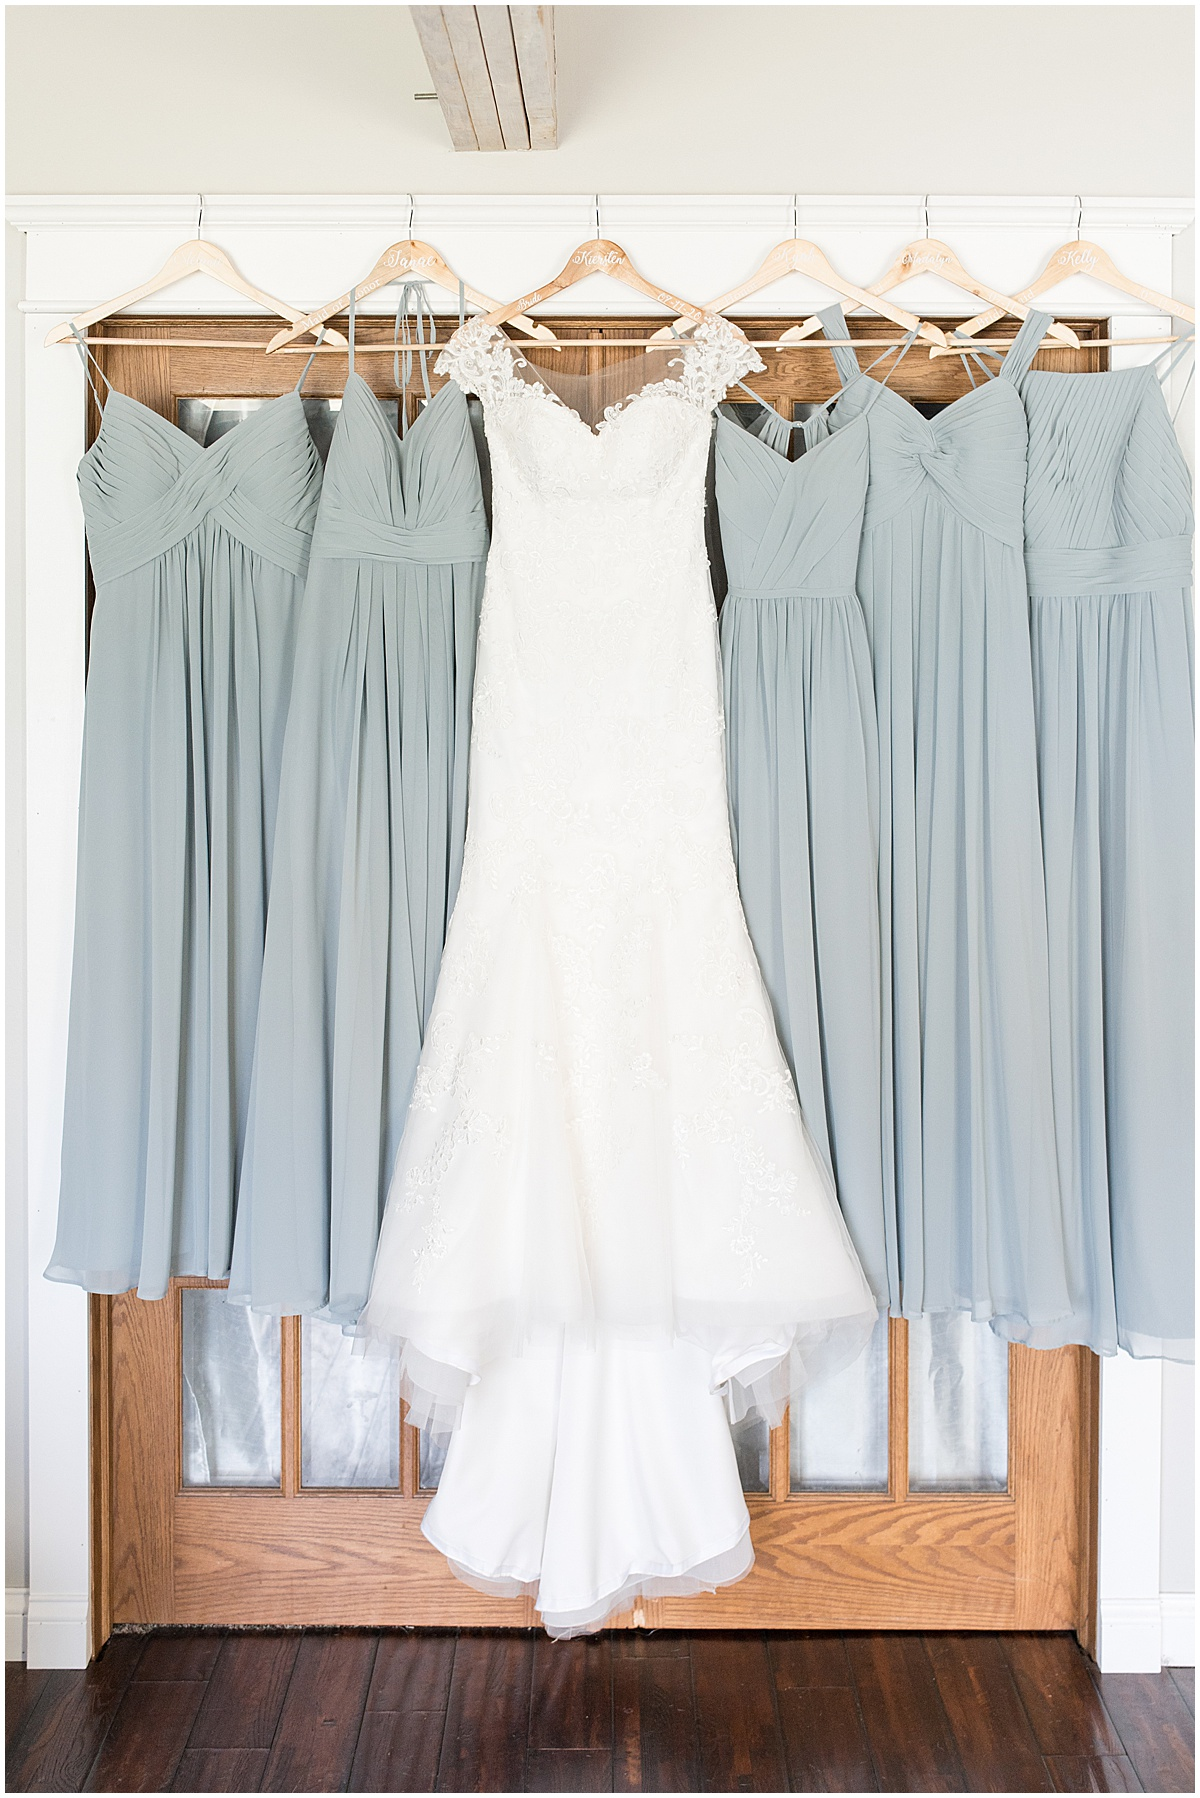 Wedding details for wedding at The Matterhorn in Elkhart, Indiana